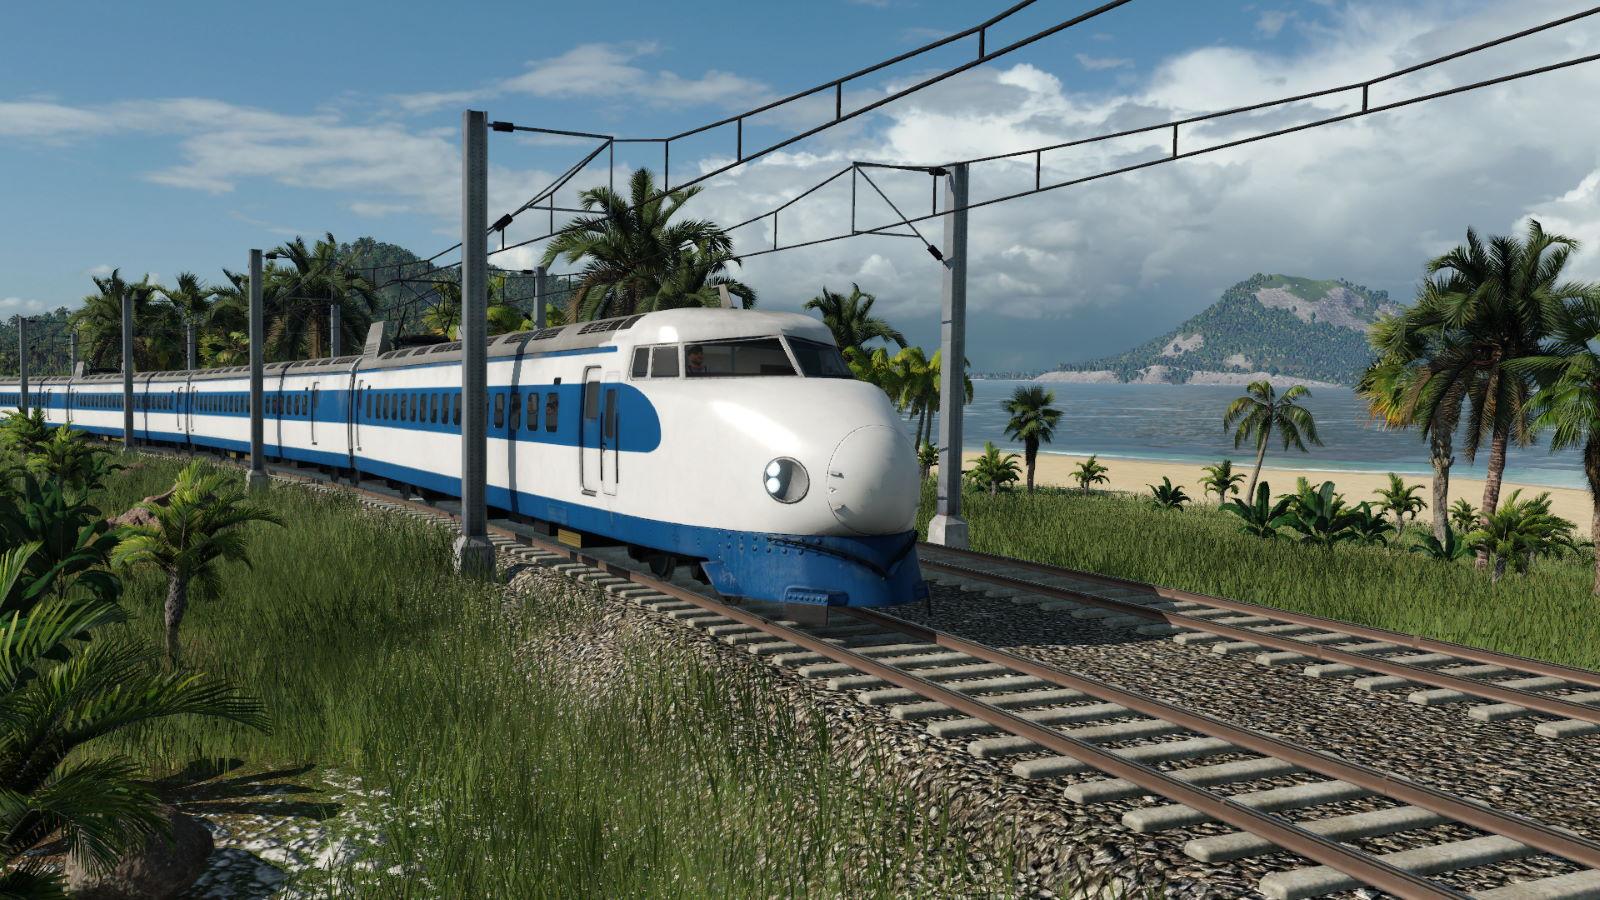 Train in Transport Fever 2